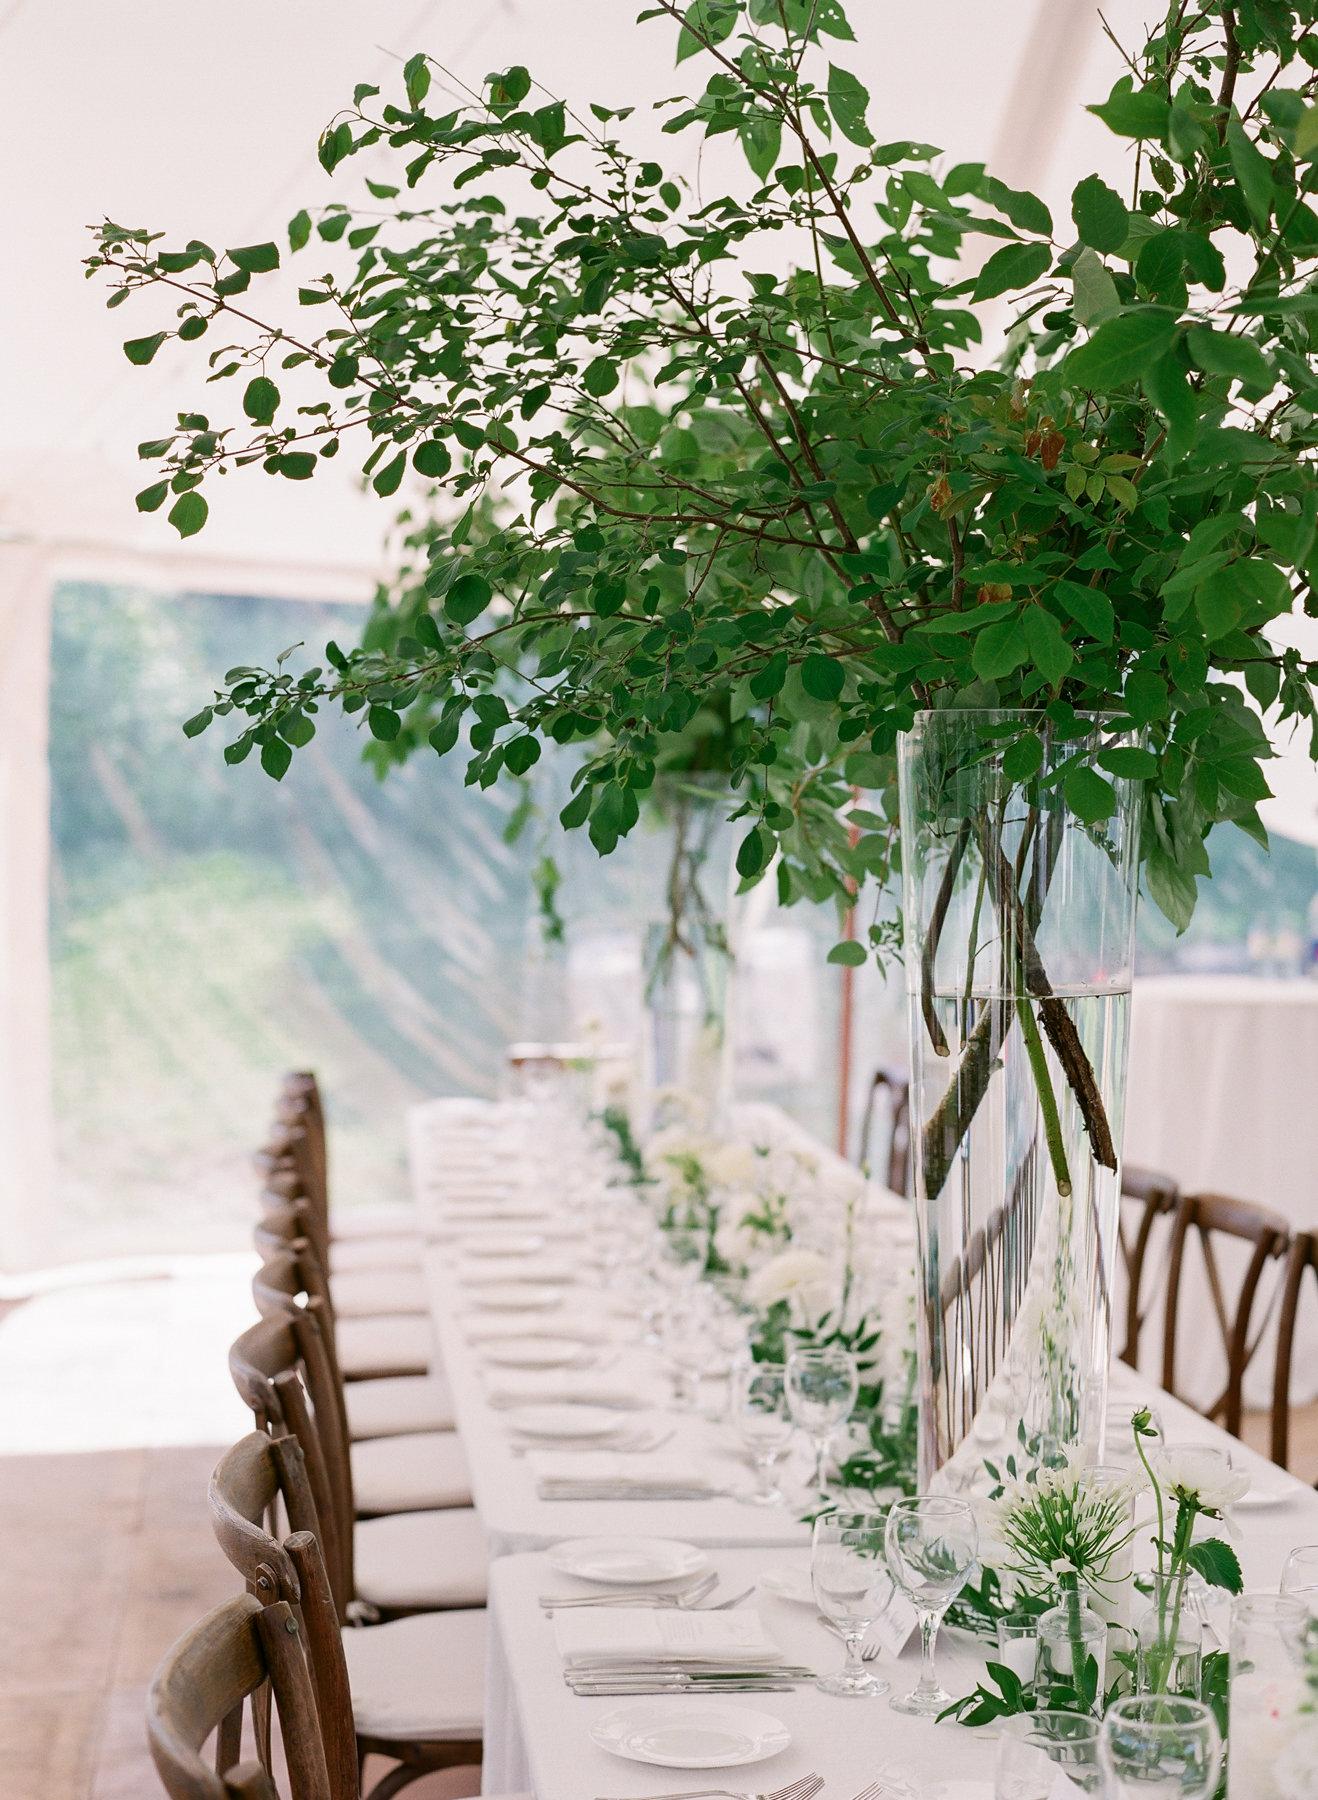 0851-maggiebrett-private-estate-wedding-000006390016.jpg